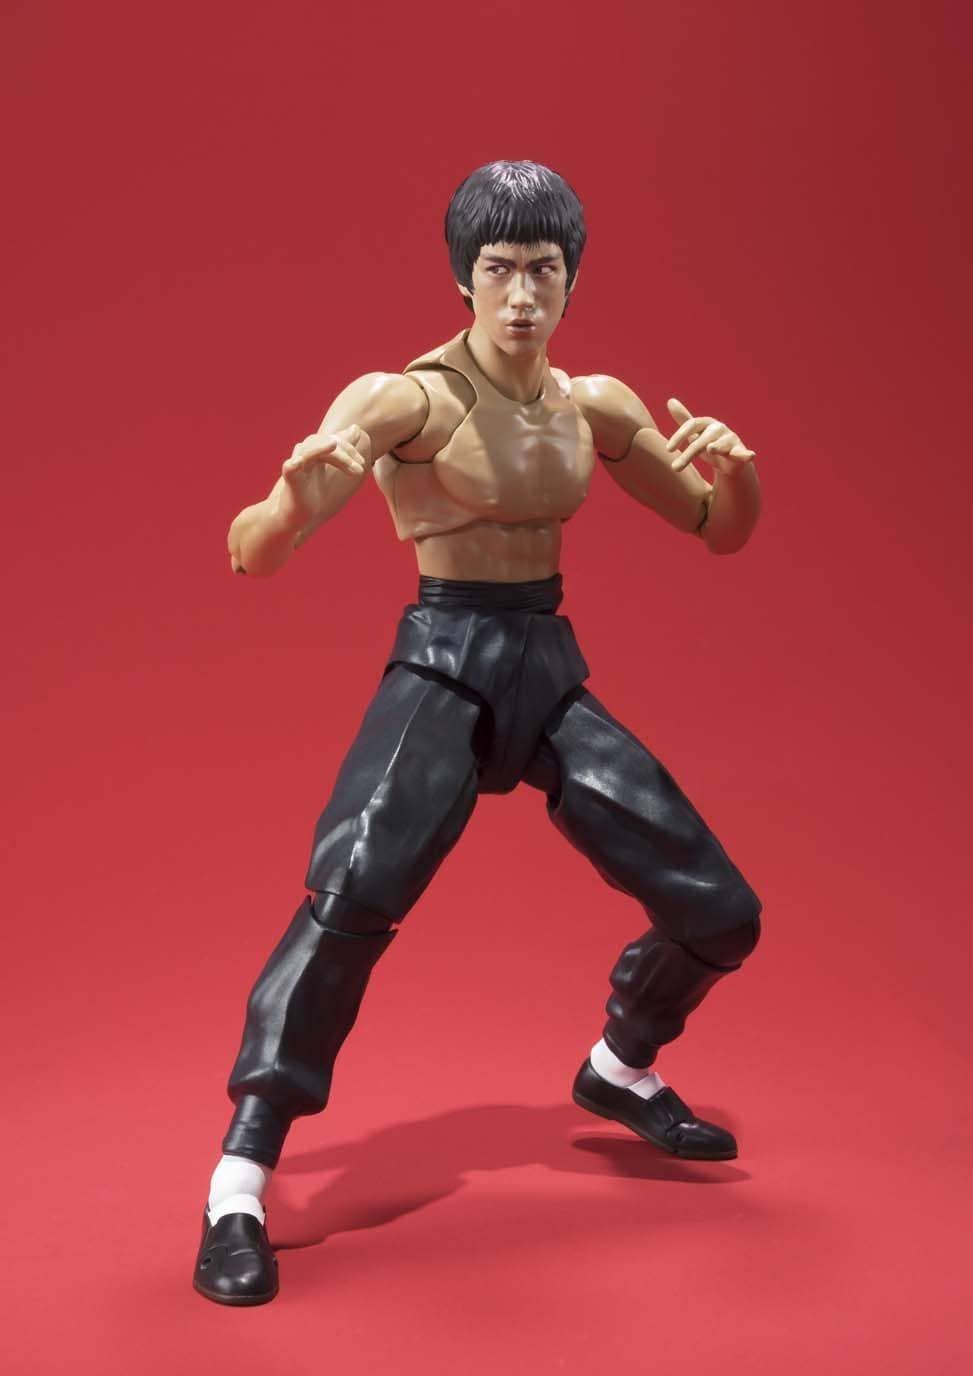 Figuarts SHF Figur Figure No Box Bruce Lee KungFu 75th Anniversary Bandai S.H